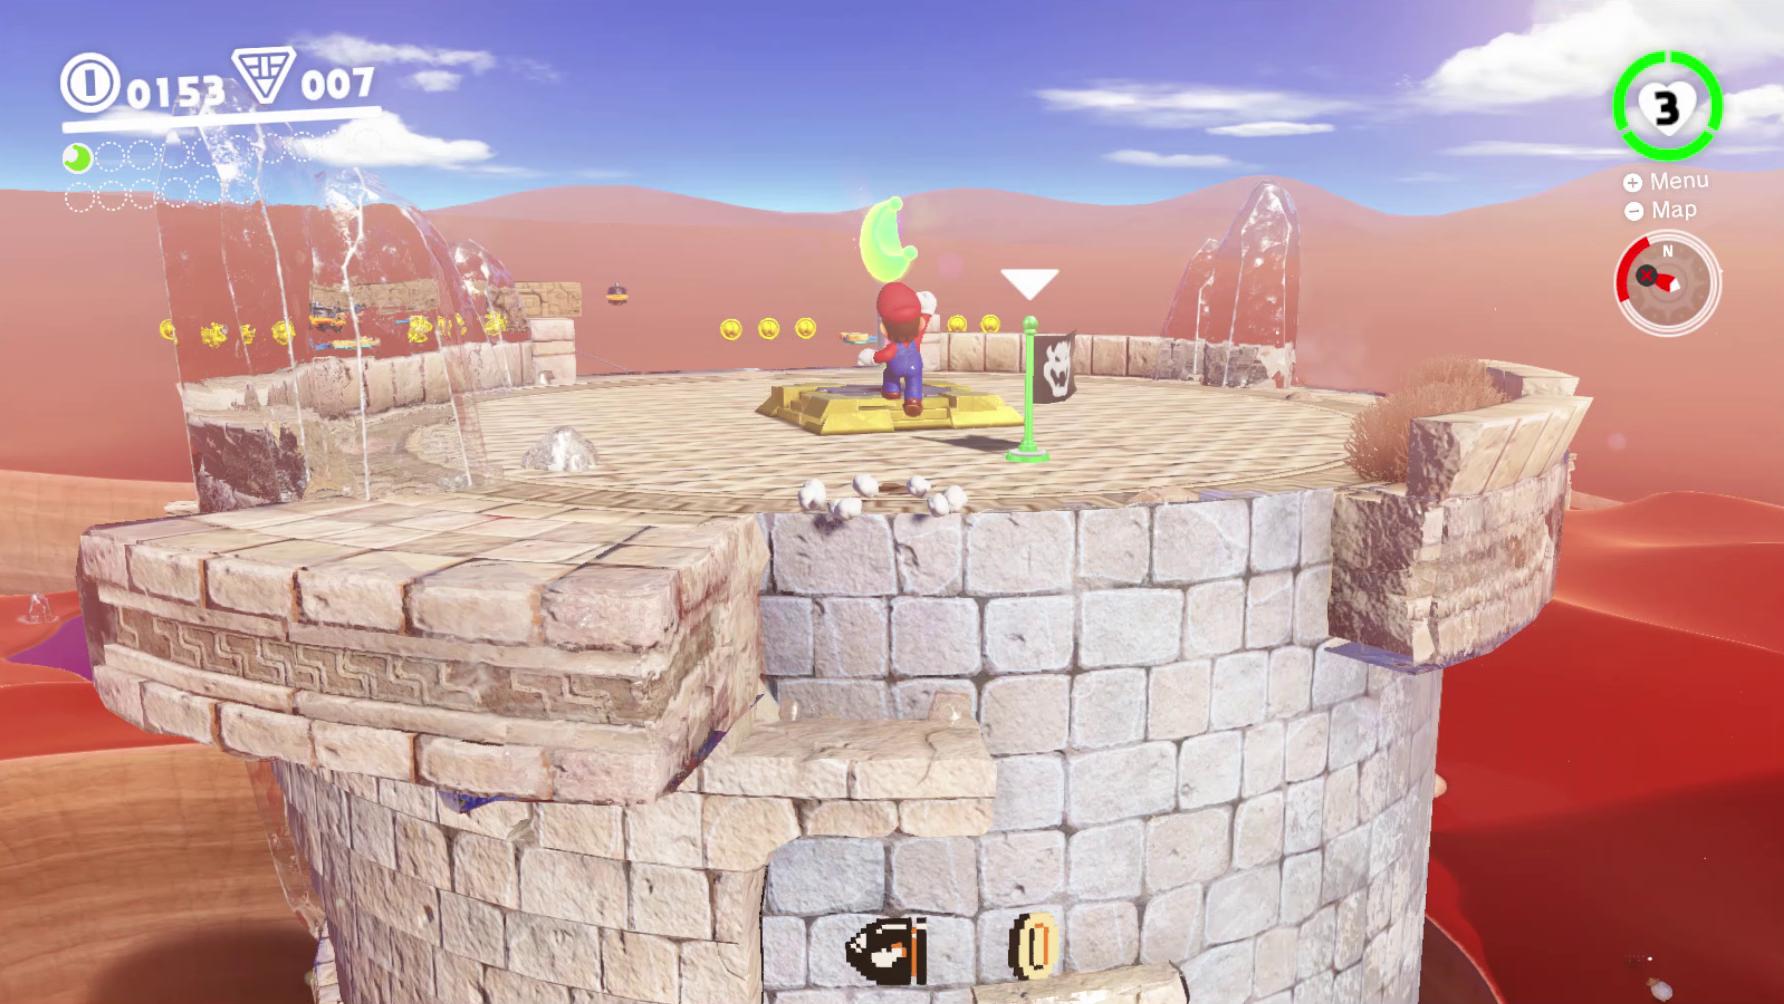 Super Mario Odyssey Guide Sand Kingdom All Power Moon Locations